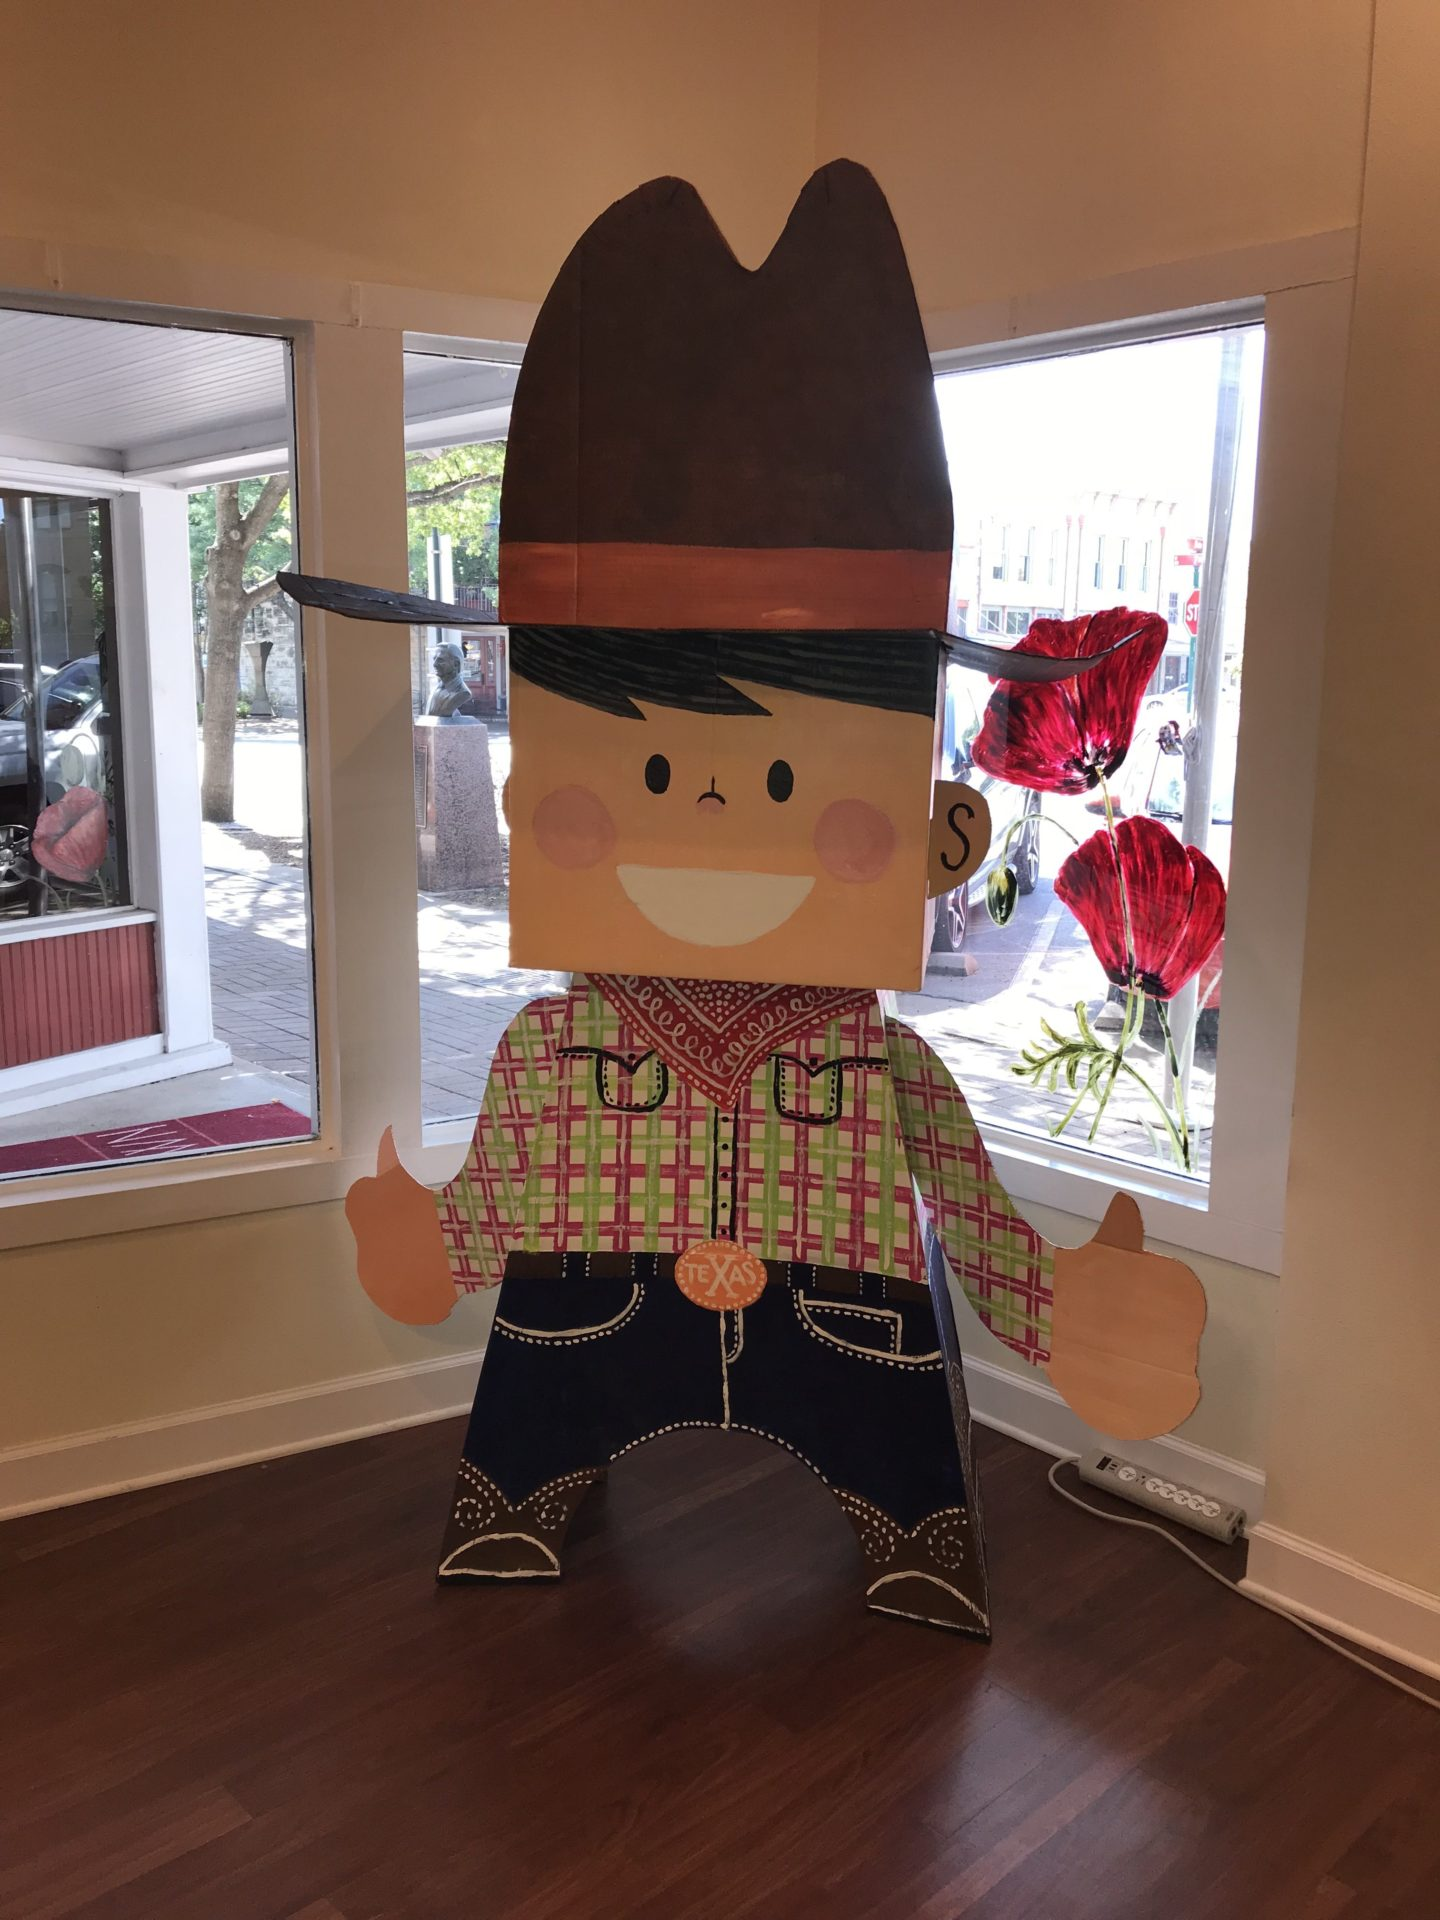 cowboy, cardboard, Georgetown, Texas